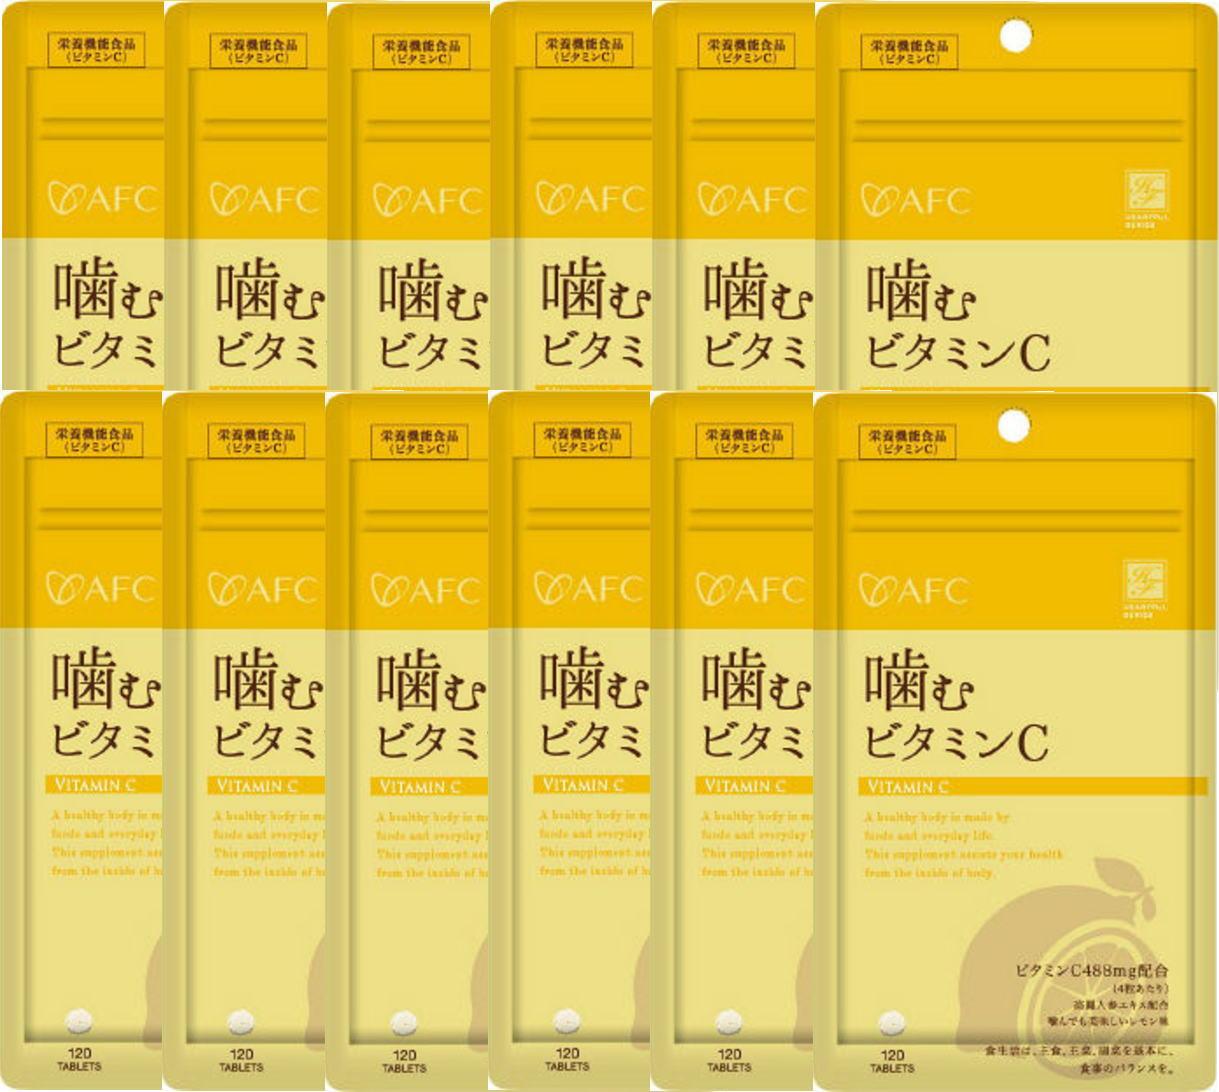 AFC 噛むビタミンC《30日分×12袋セット》ハートフルシリーズ(エーエフシー サプリメント)